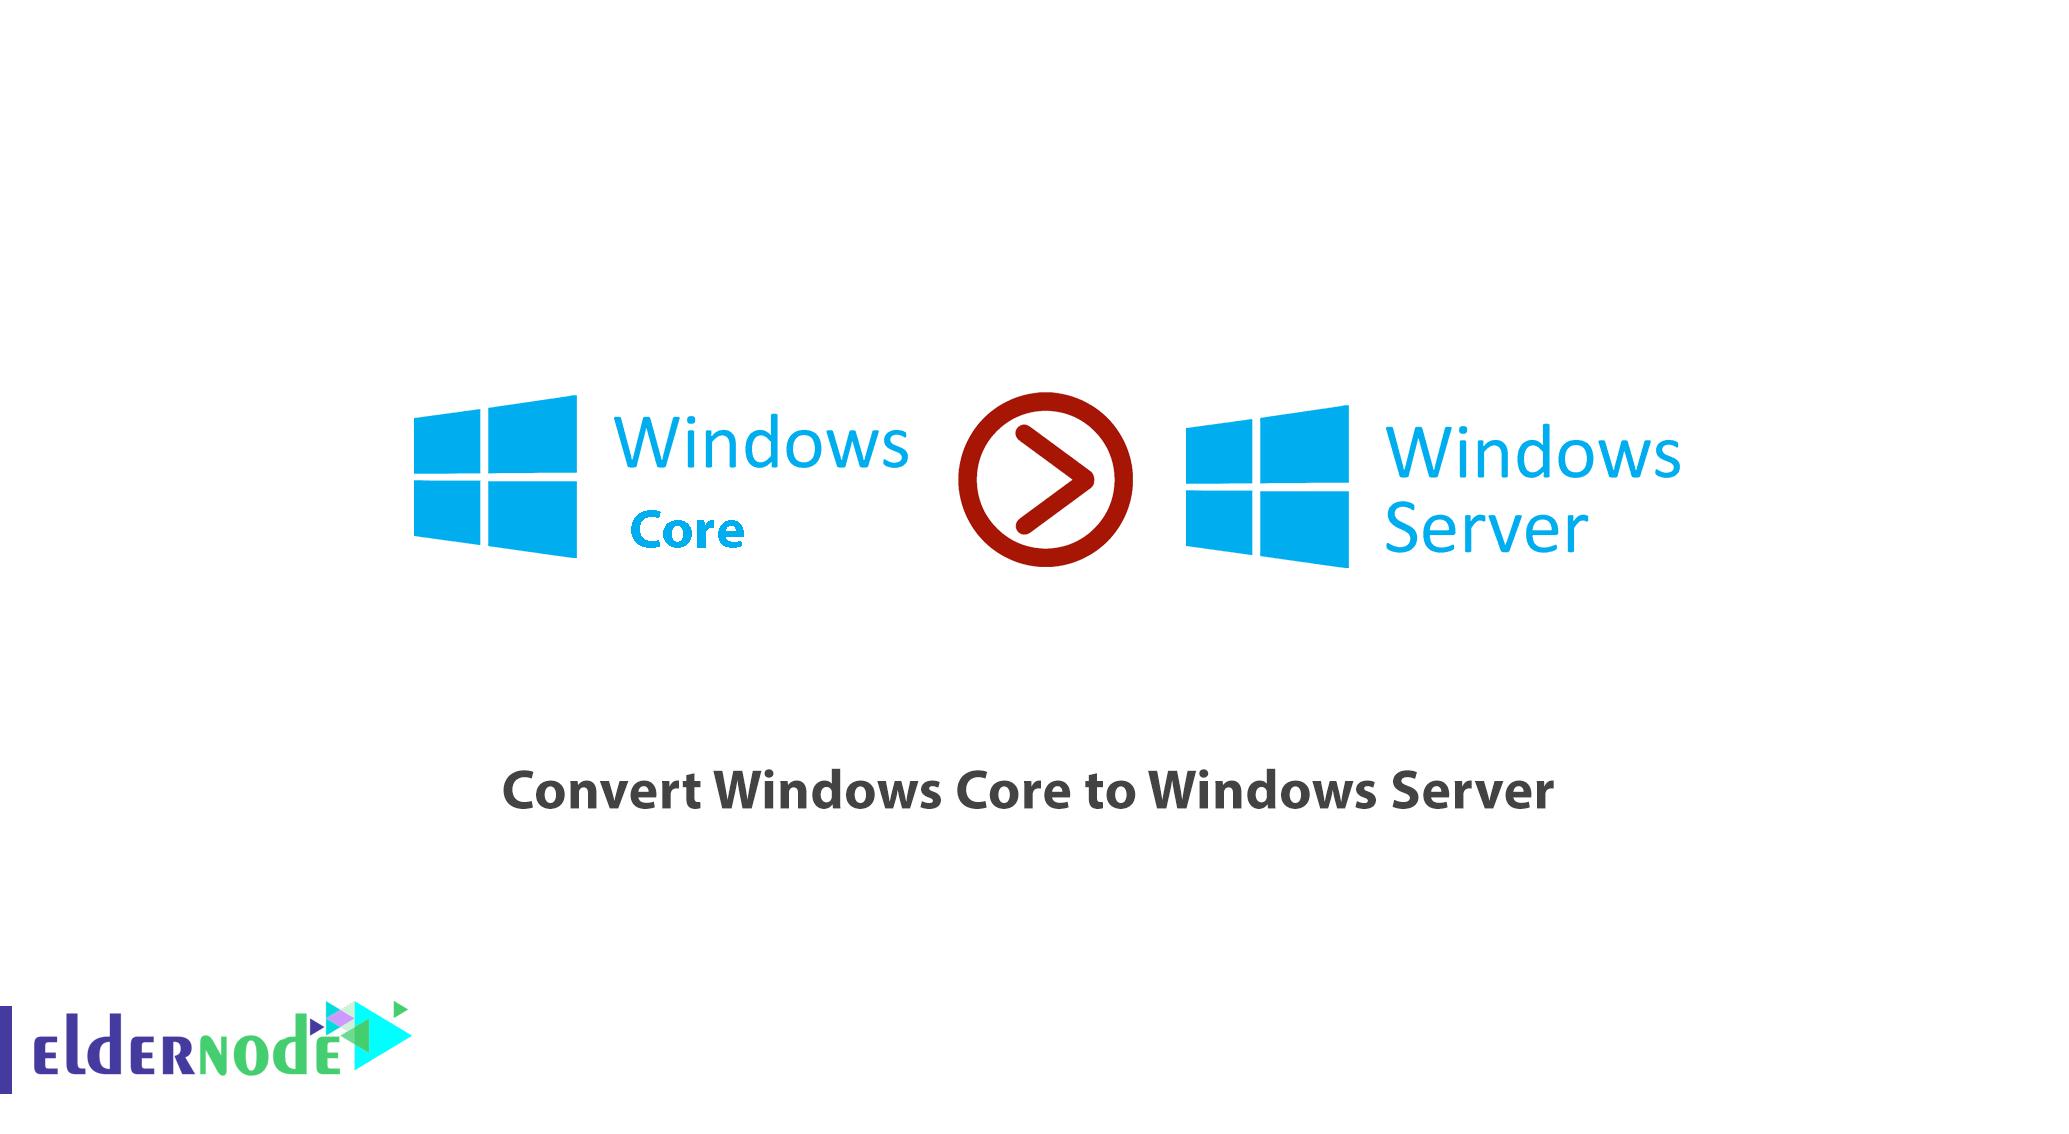 How to convert Windows Core to Windows Server